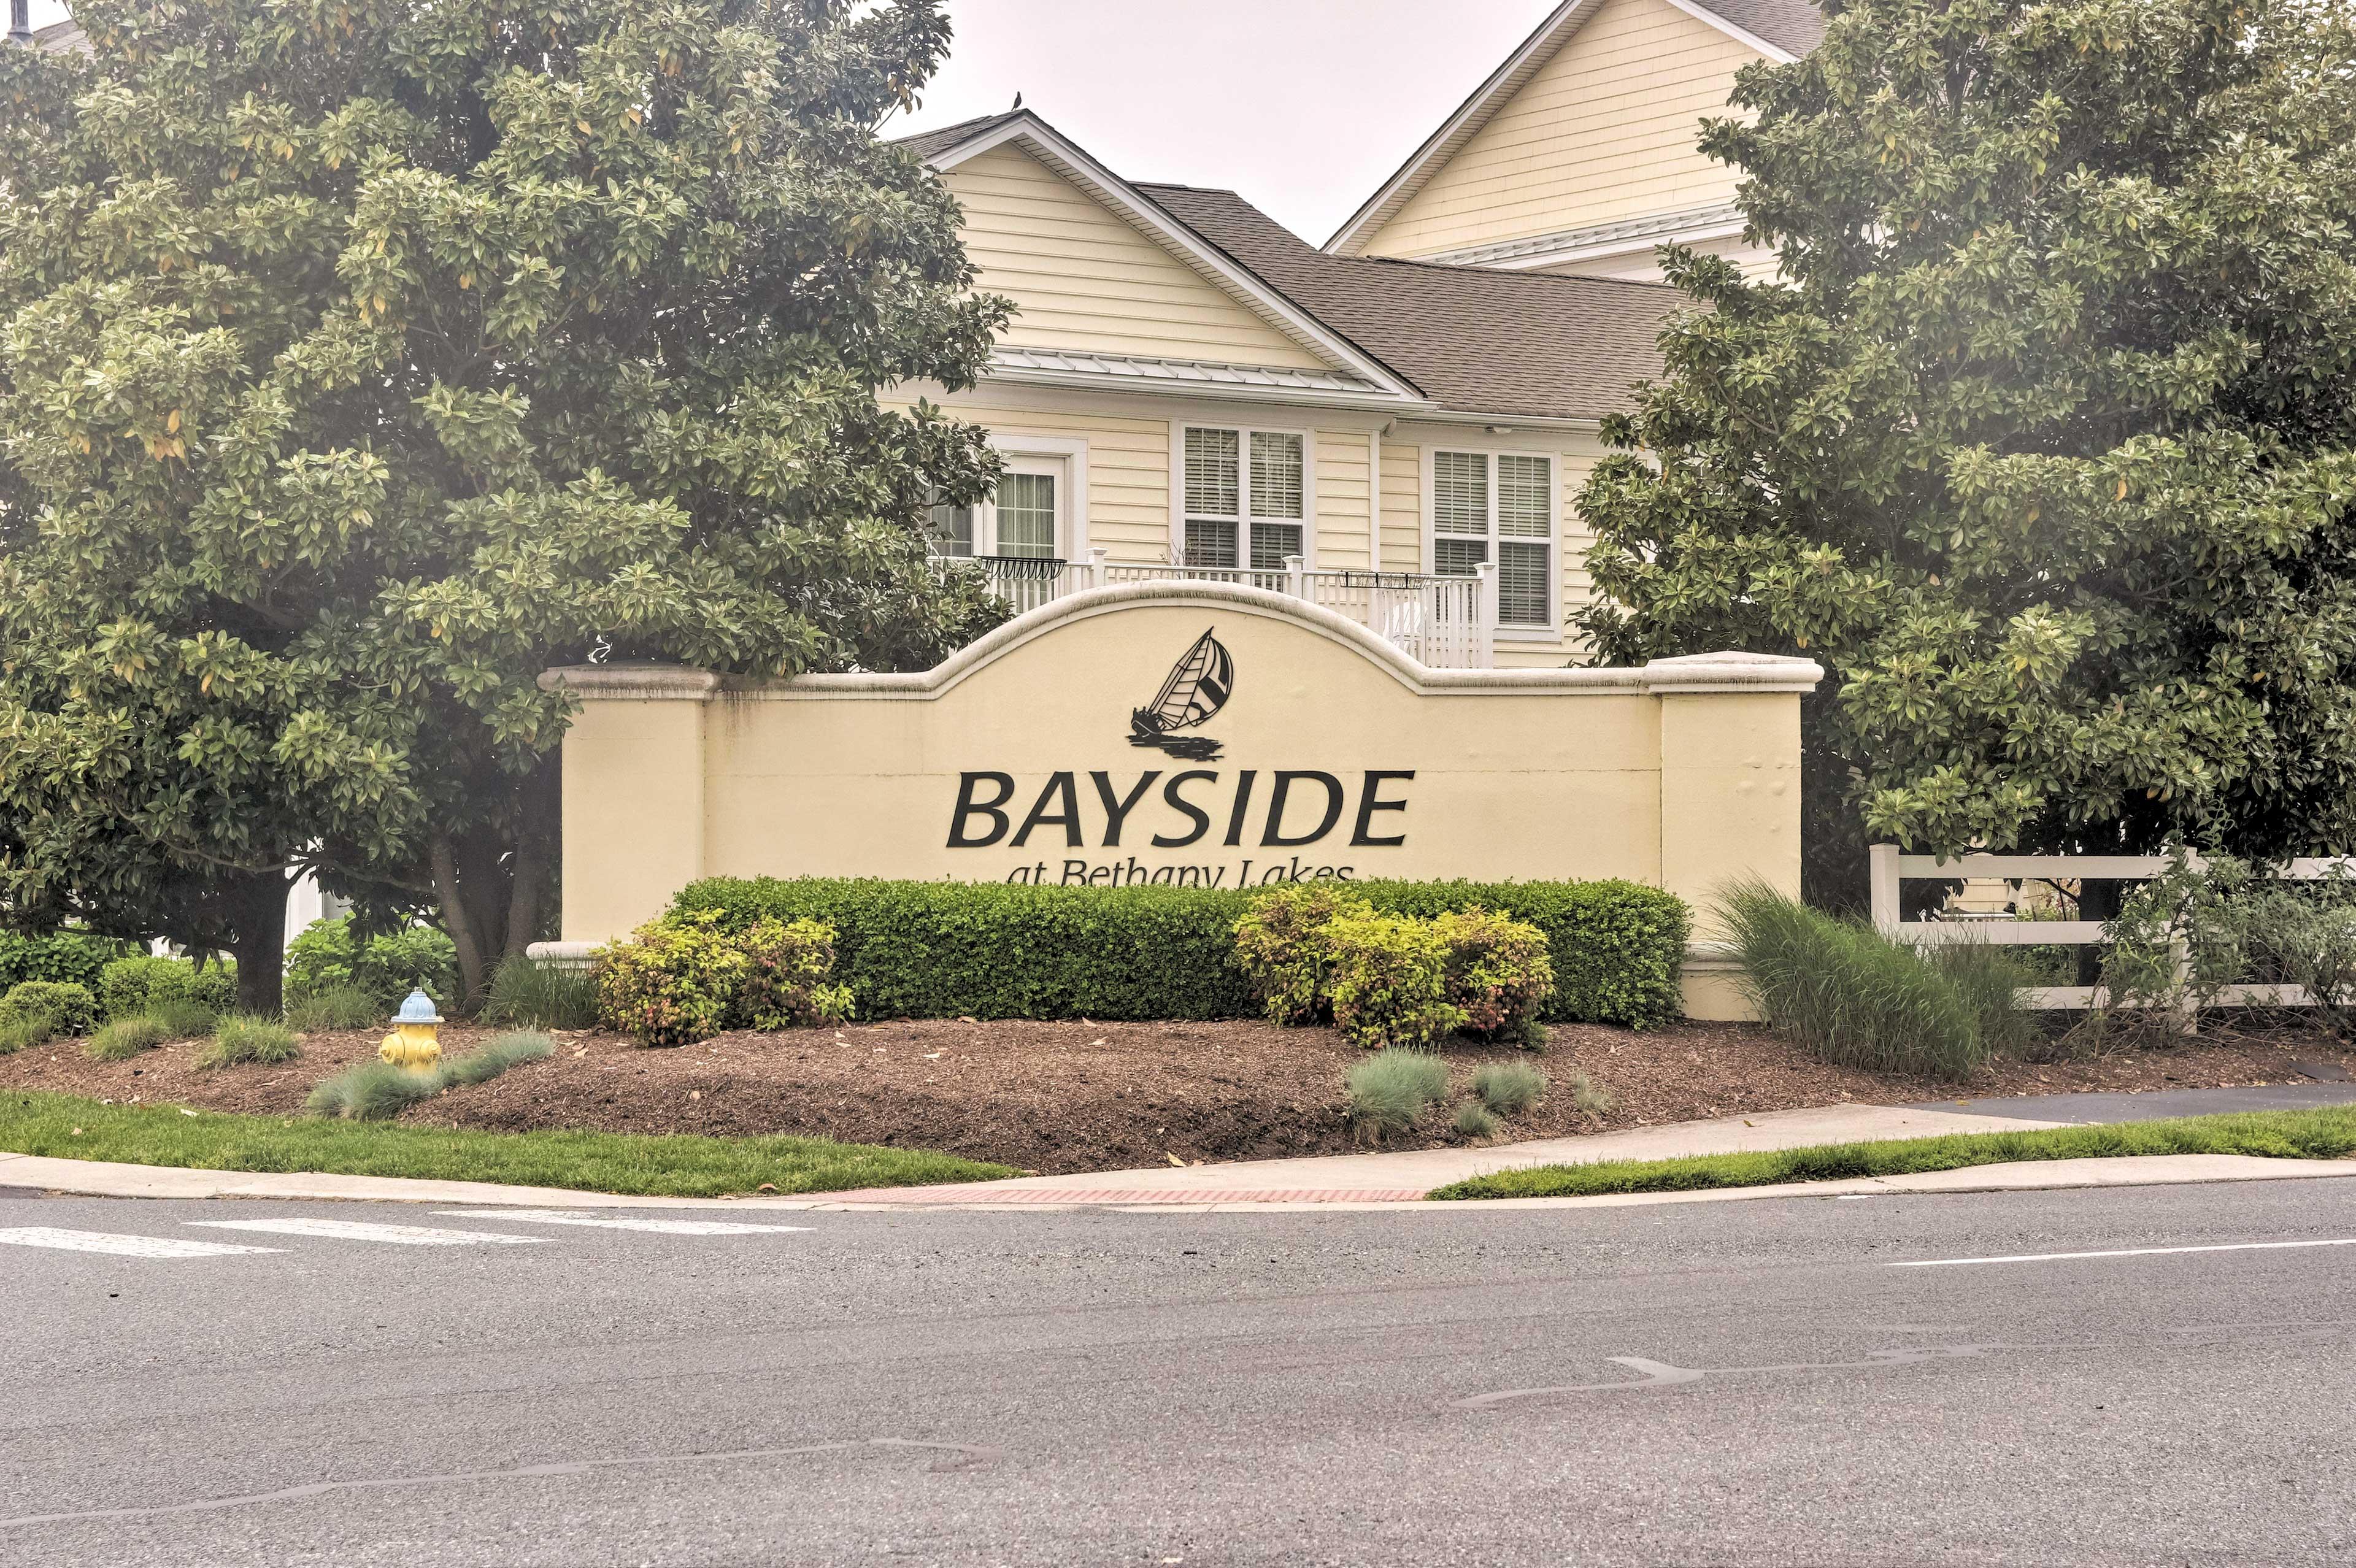 Plan your Bayside at Bethany Lakes getaway!